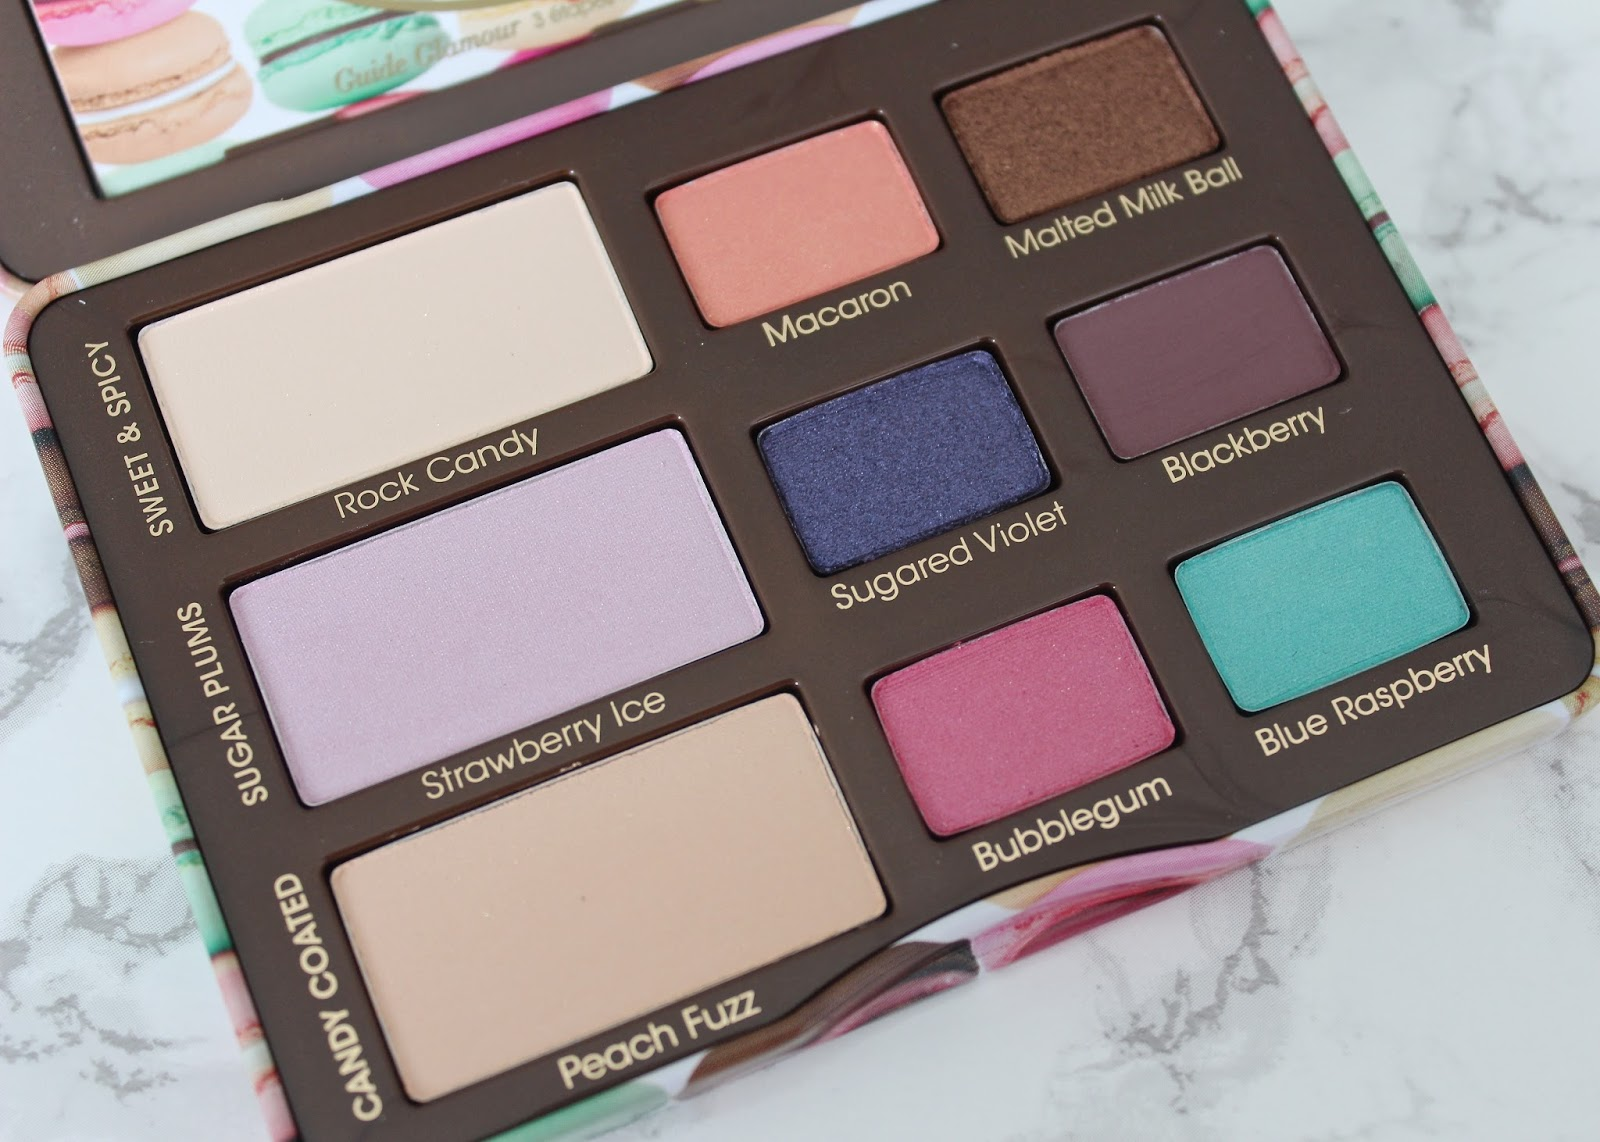 Sugar Cookie Eyeshadow Palette by Too Faced #20